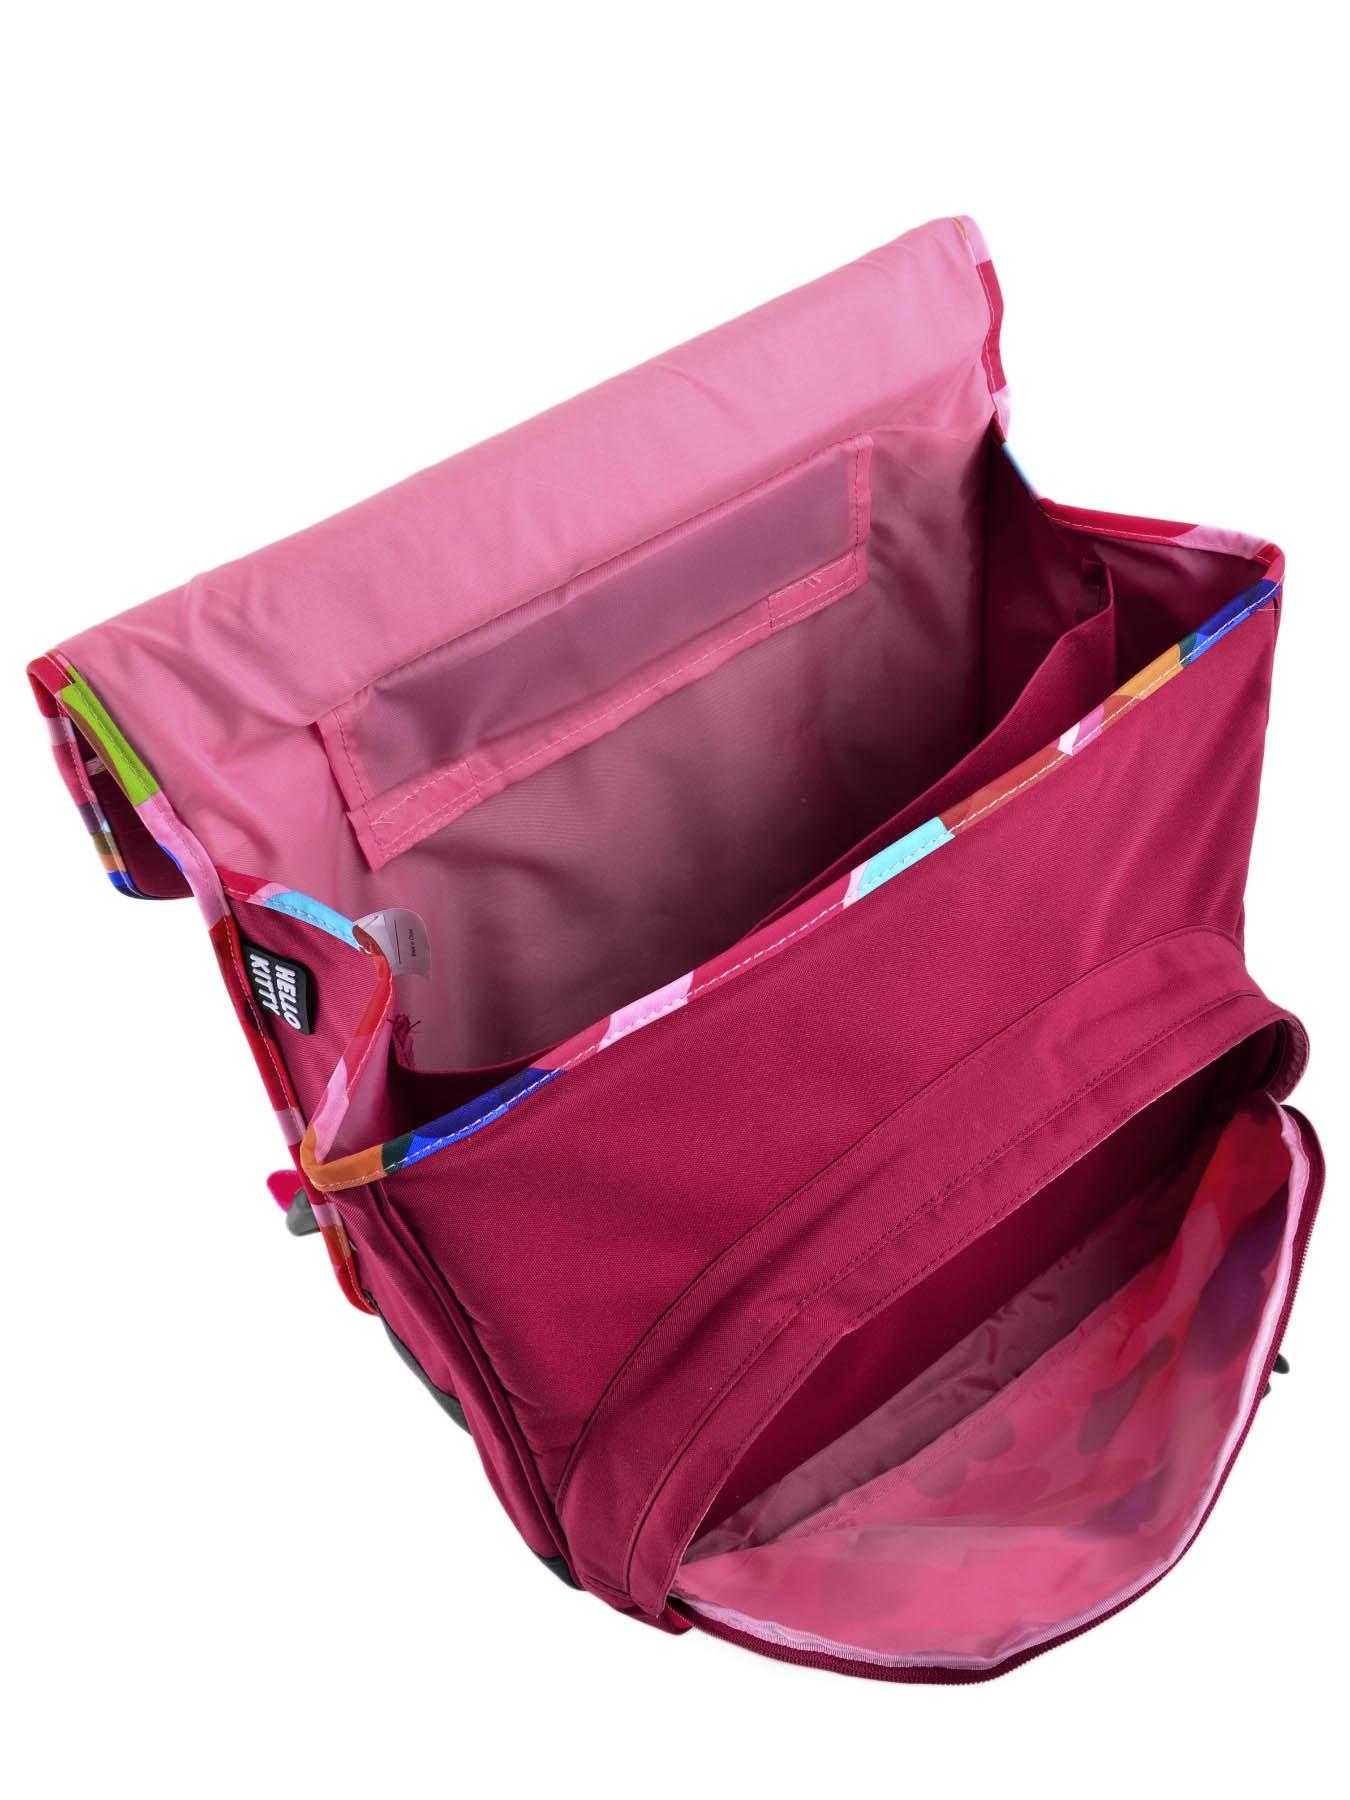 Школьный портфель на колесах Hello Kitty арт. HPS23070R, - фото 8